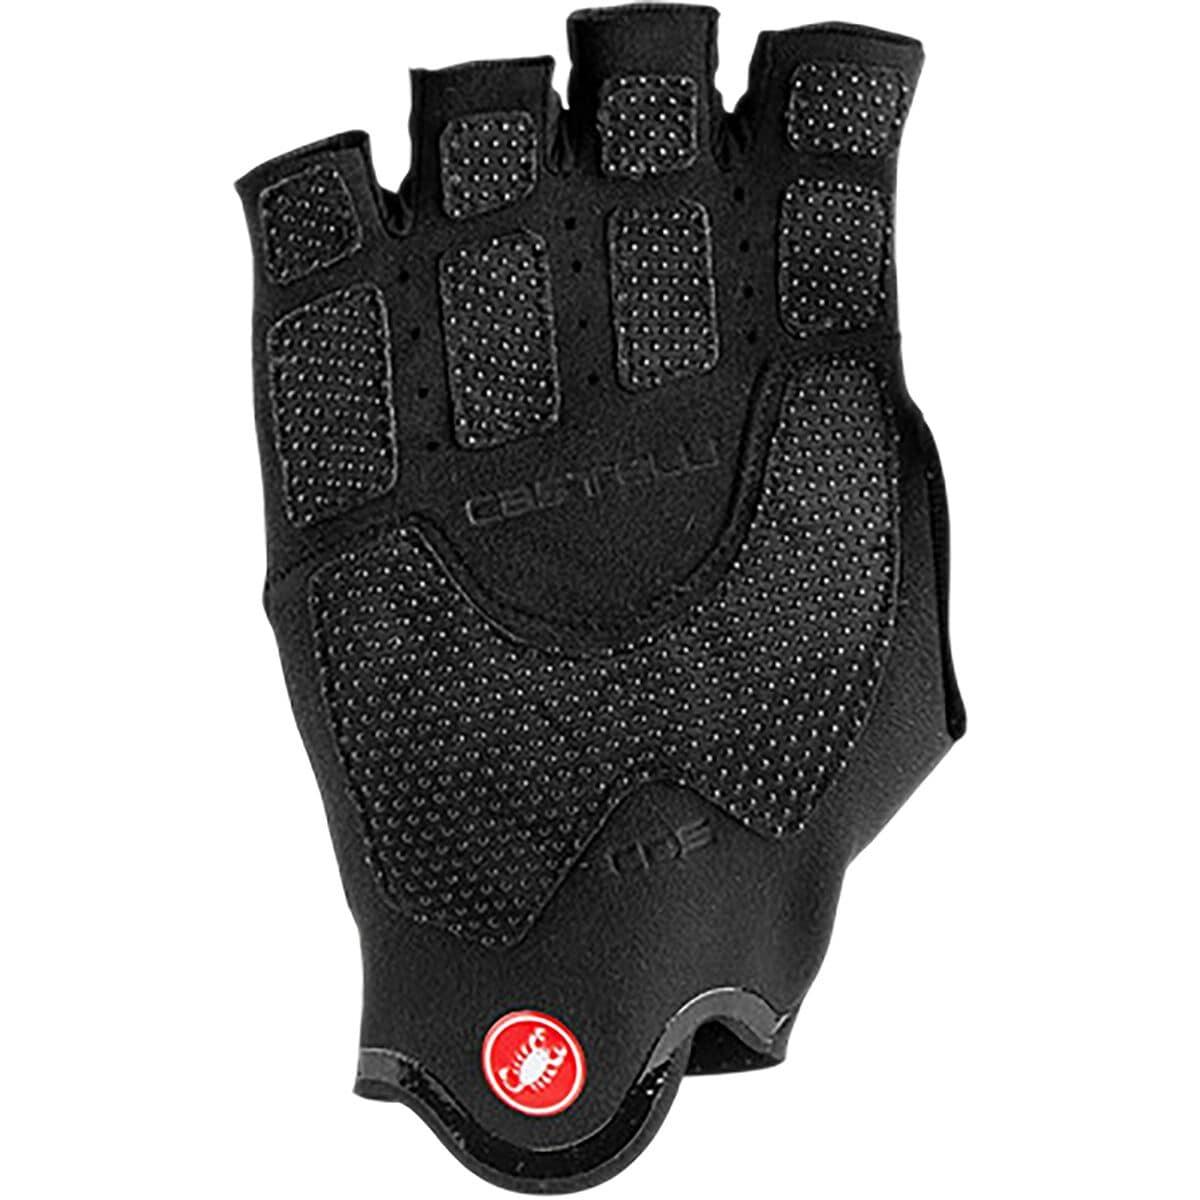 Castelli-Cabrio-Glove-Men-039-s miniature 8